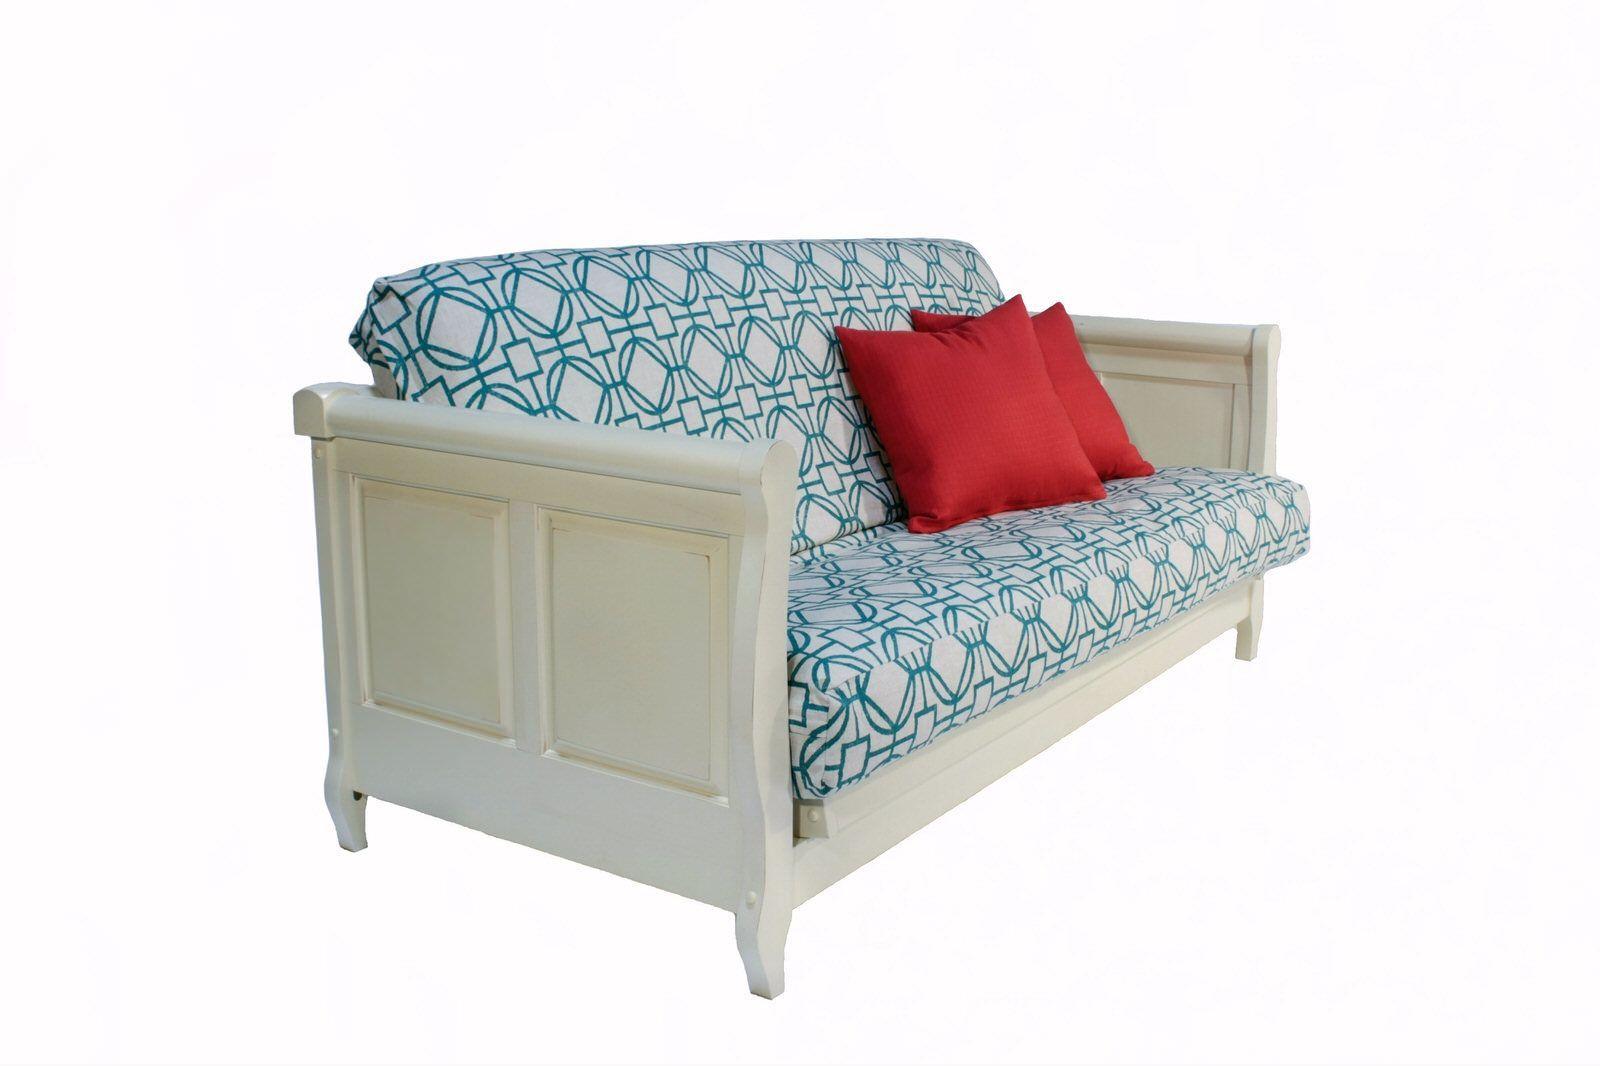 Adriana White Wall Hugger Futon Frame Futon Mattress Upscale Furniture